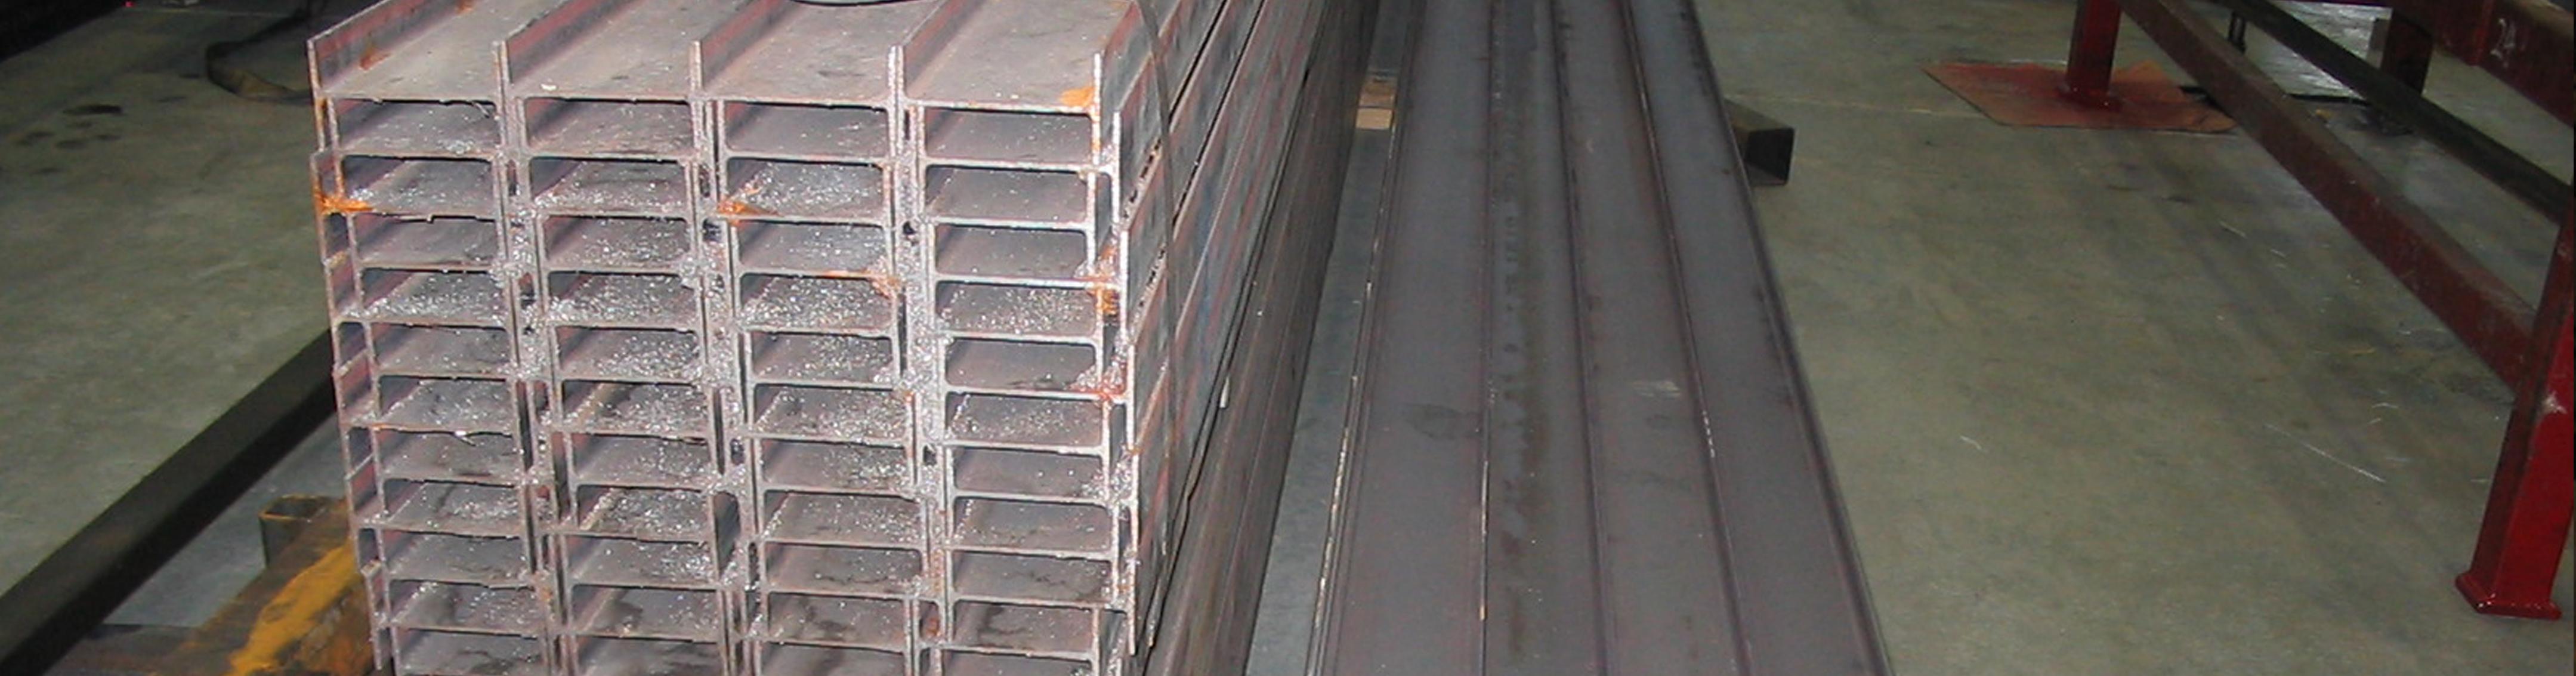 "S4 x 7.7 Standard Steel I-Beam 24/"" Long"